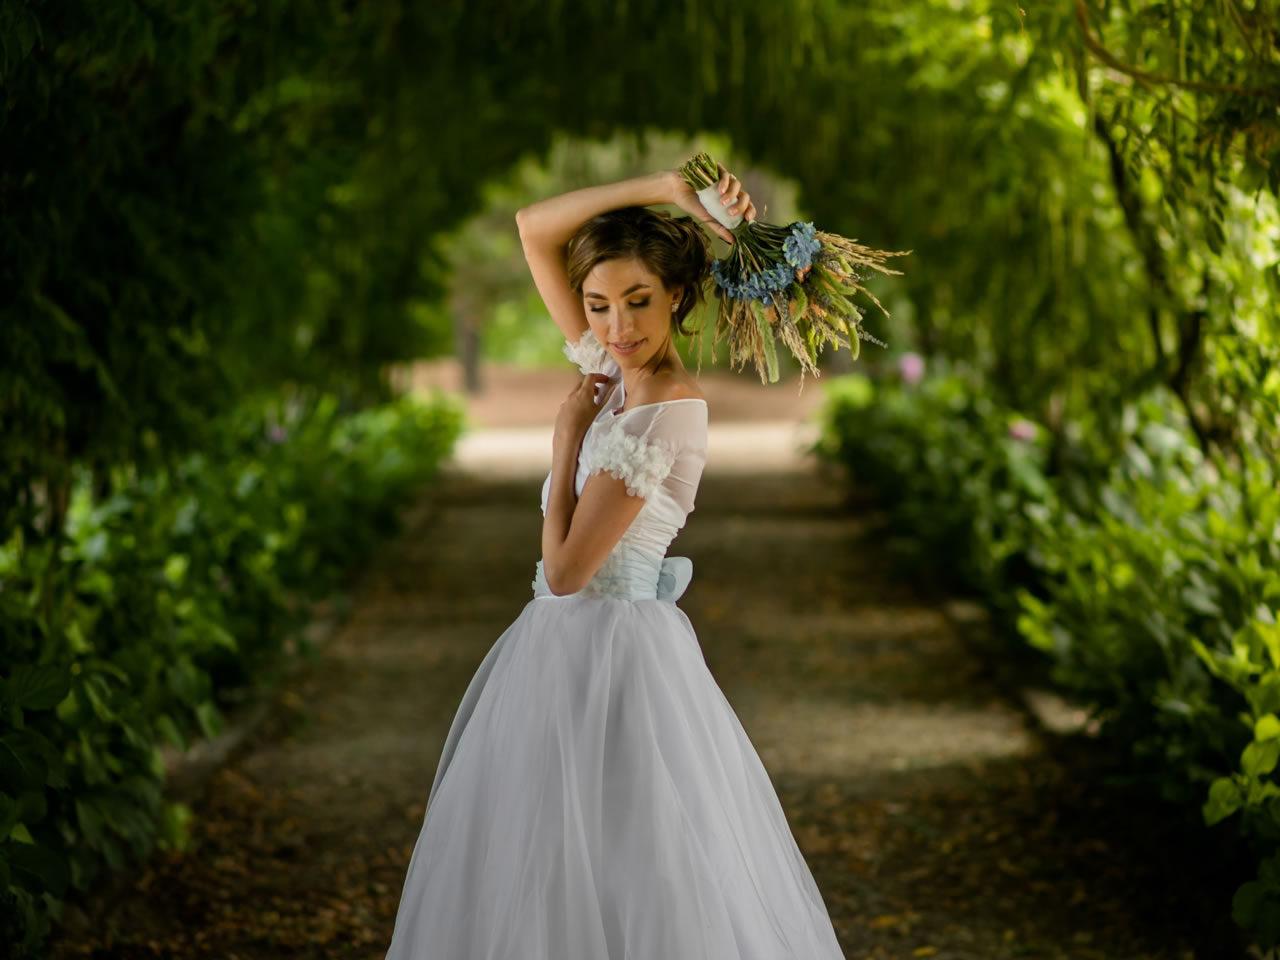 Bow :: Amazing wedding day at Il Borro :: Photo - 27 :: Bow